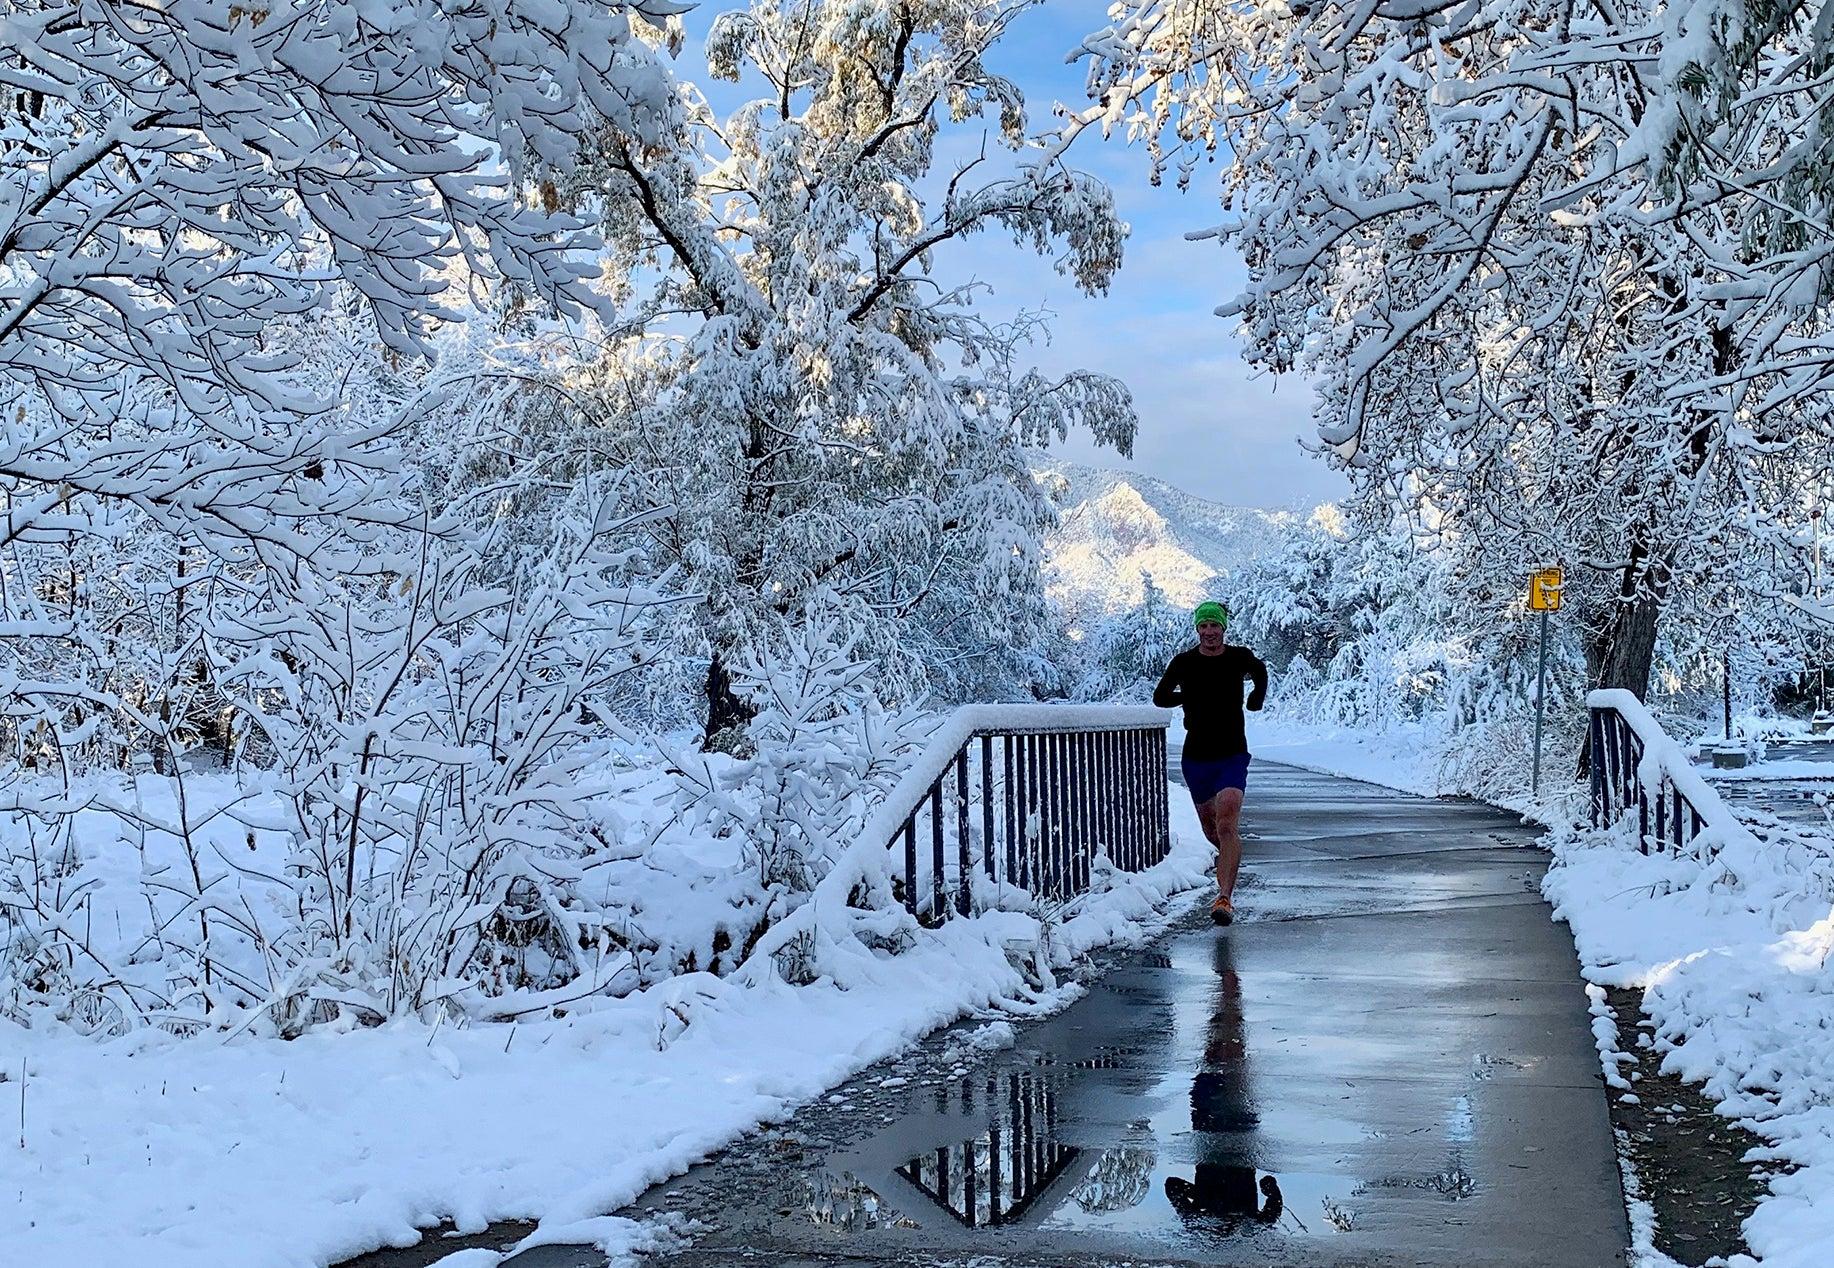 slippery surface winter running